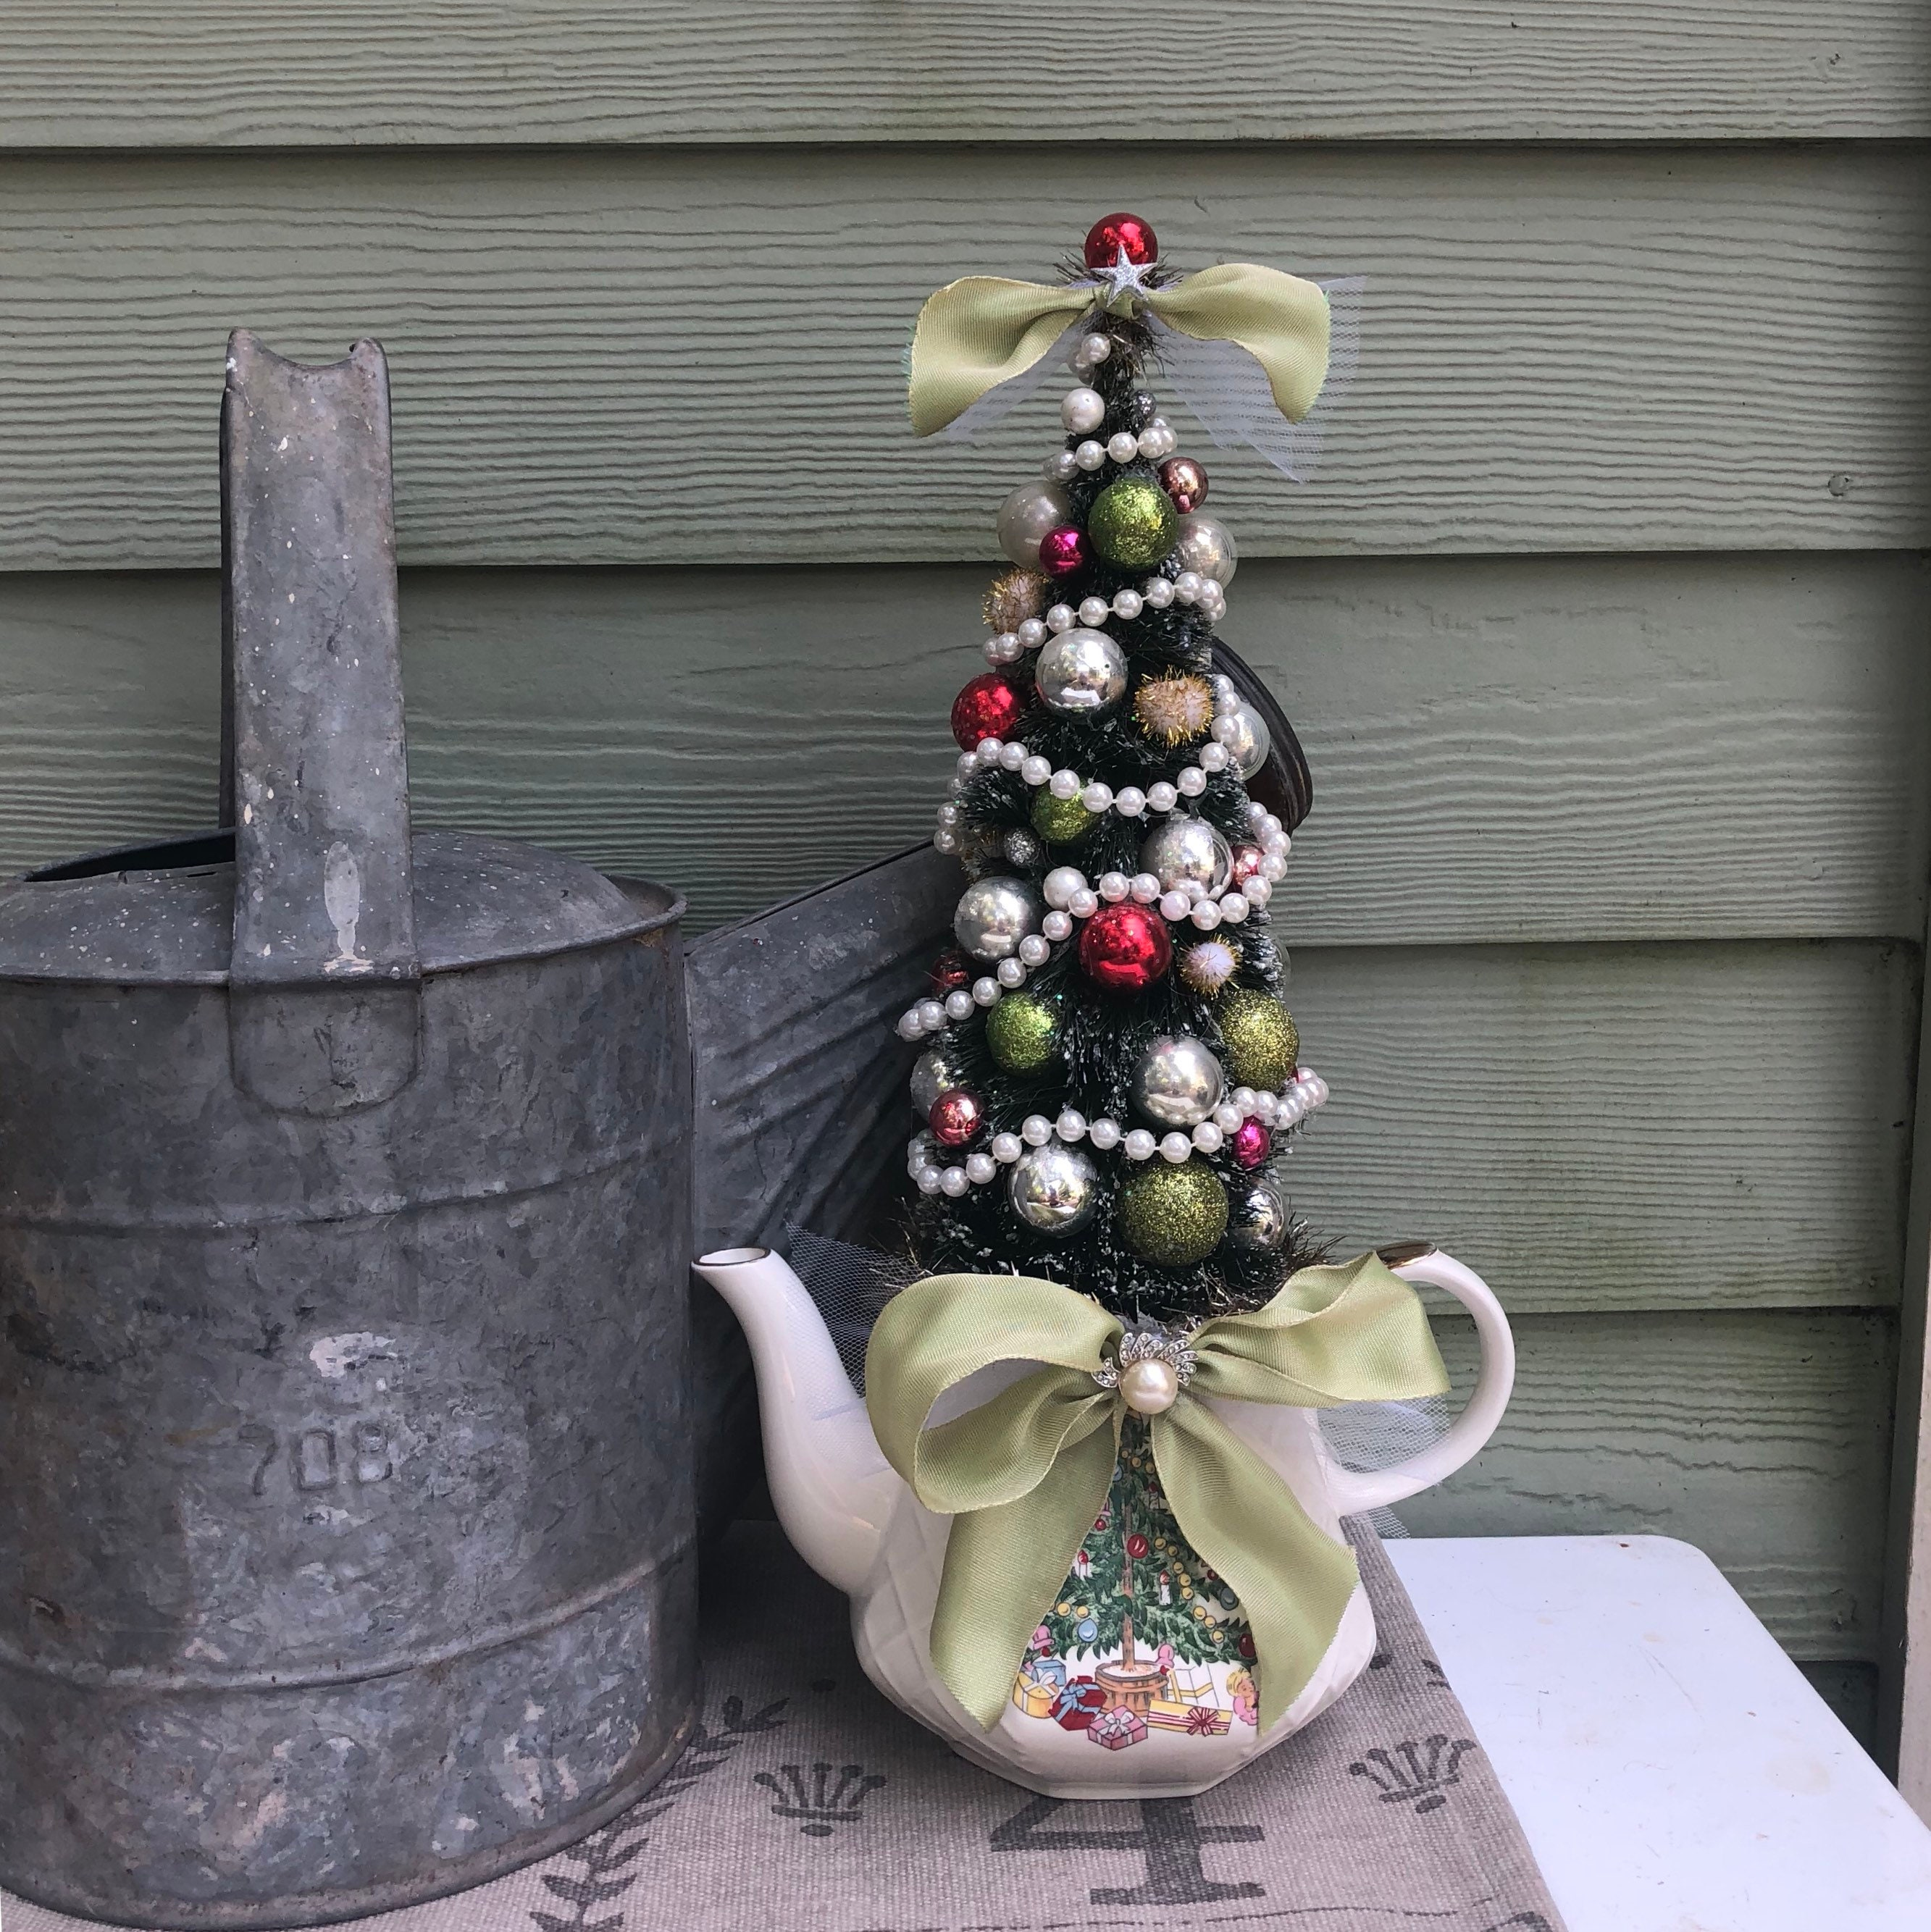 Shabby Chic Cottage Christmas Tree Holiday Centerpiece Decoration With Vintage China Teapot Vintage Jewelry Bottle Brush Tree